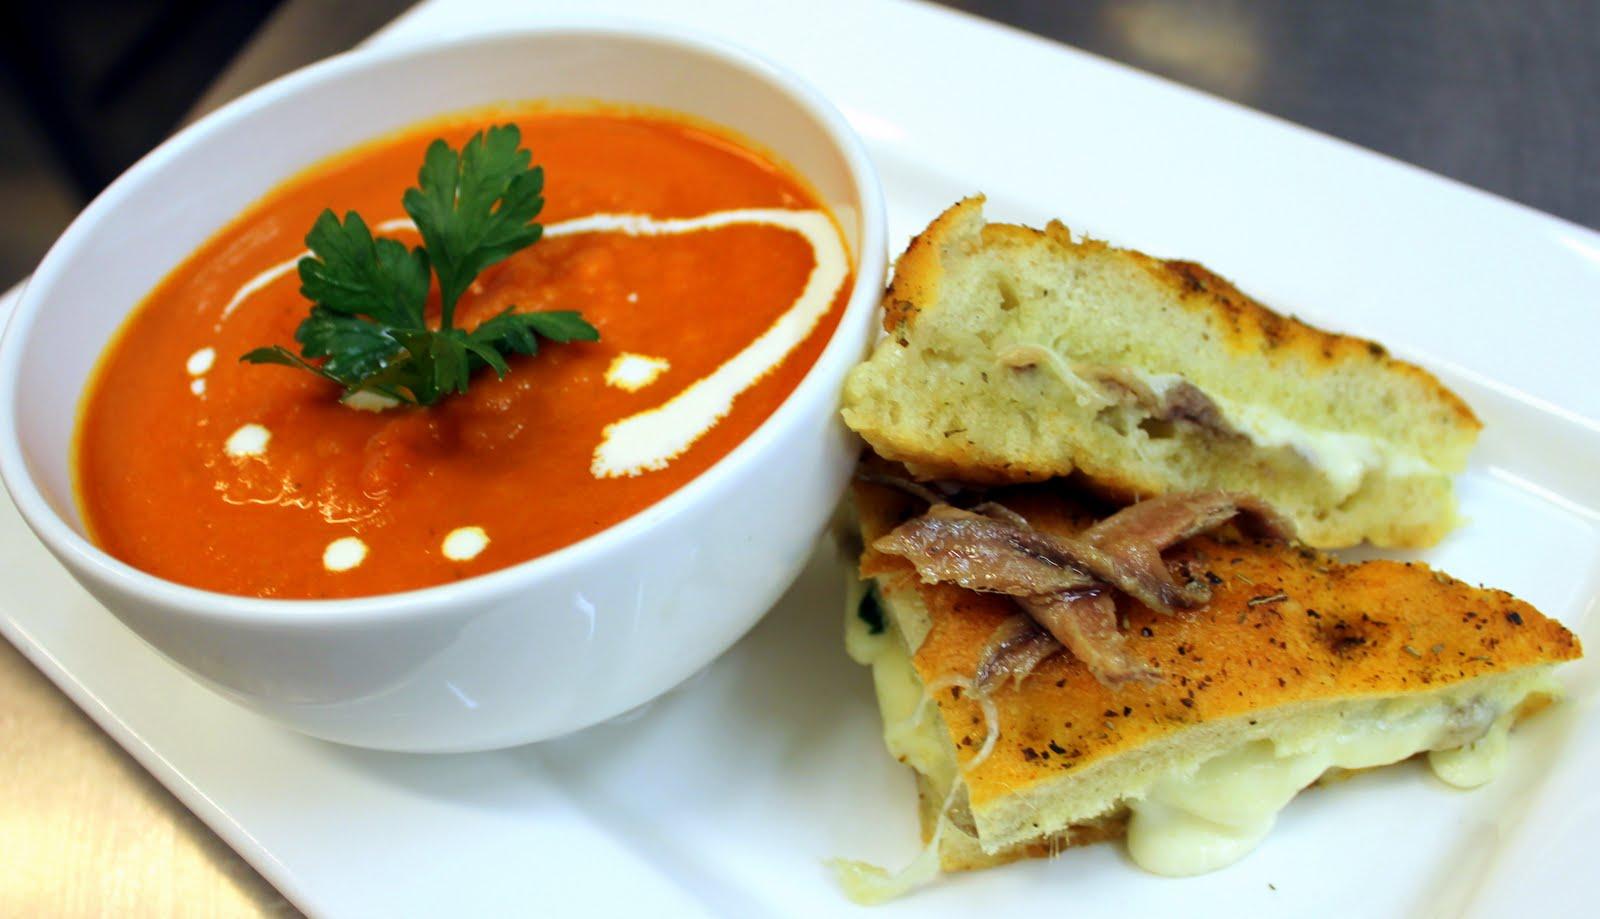 ... Bianca: Cream soups - Cauliflower, blue cheese and black truffle soup